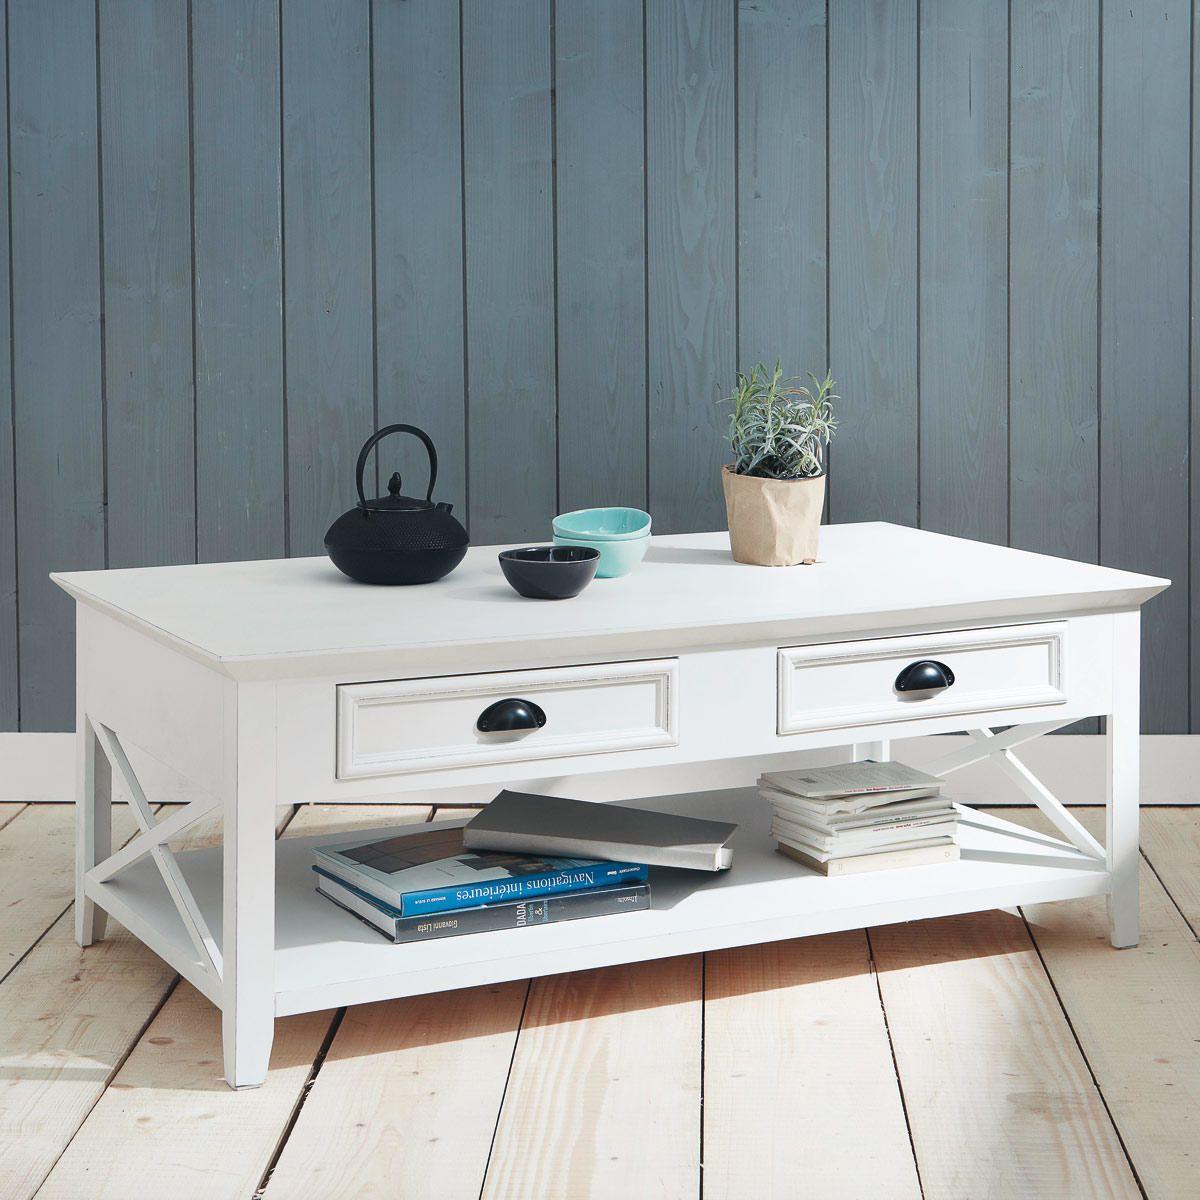 Maisons Du Monde Newport Wooden Coffee Table Table Basse En Pin Table Basse Table Basse Bois Blanc